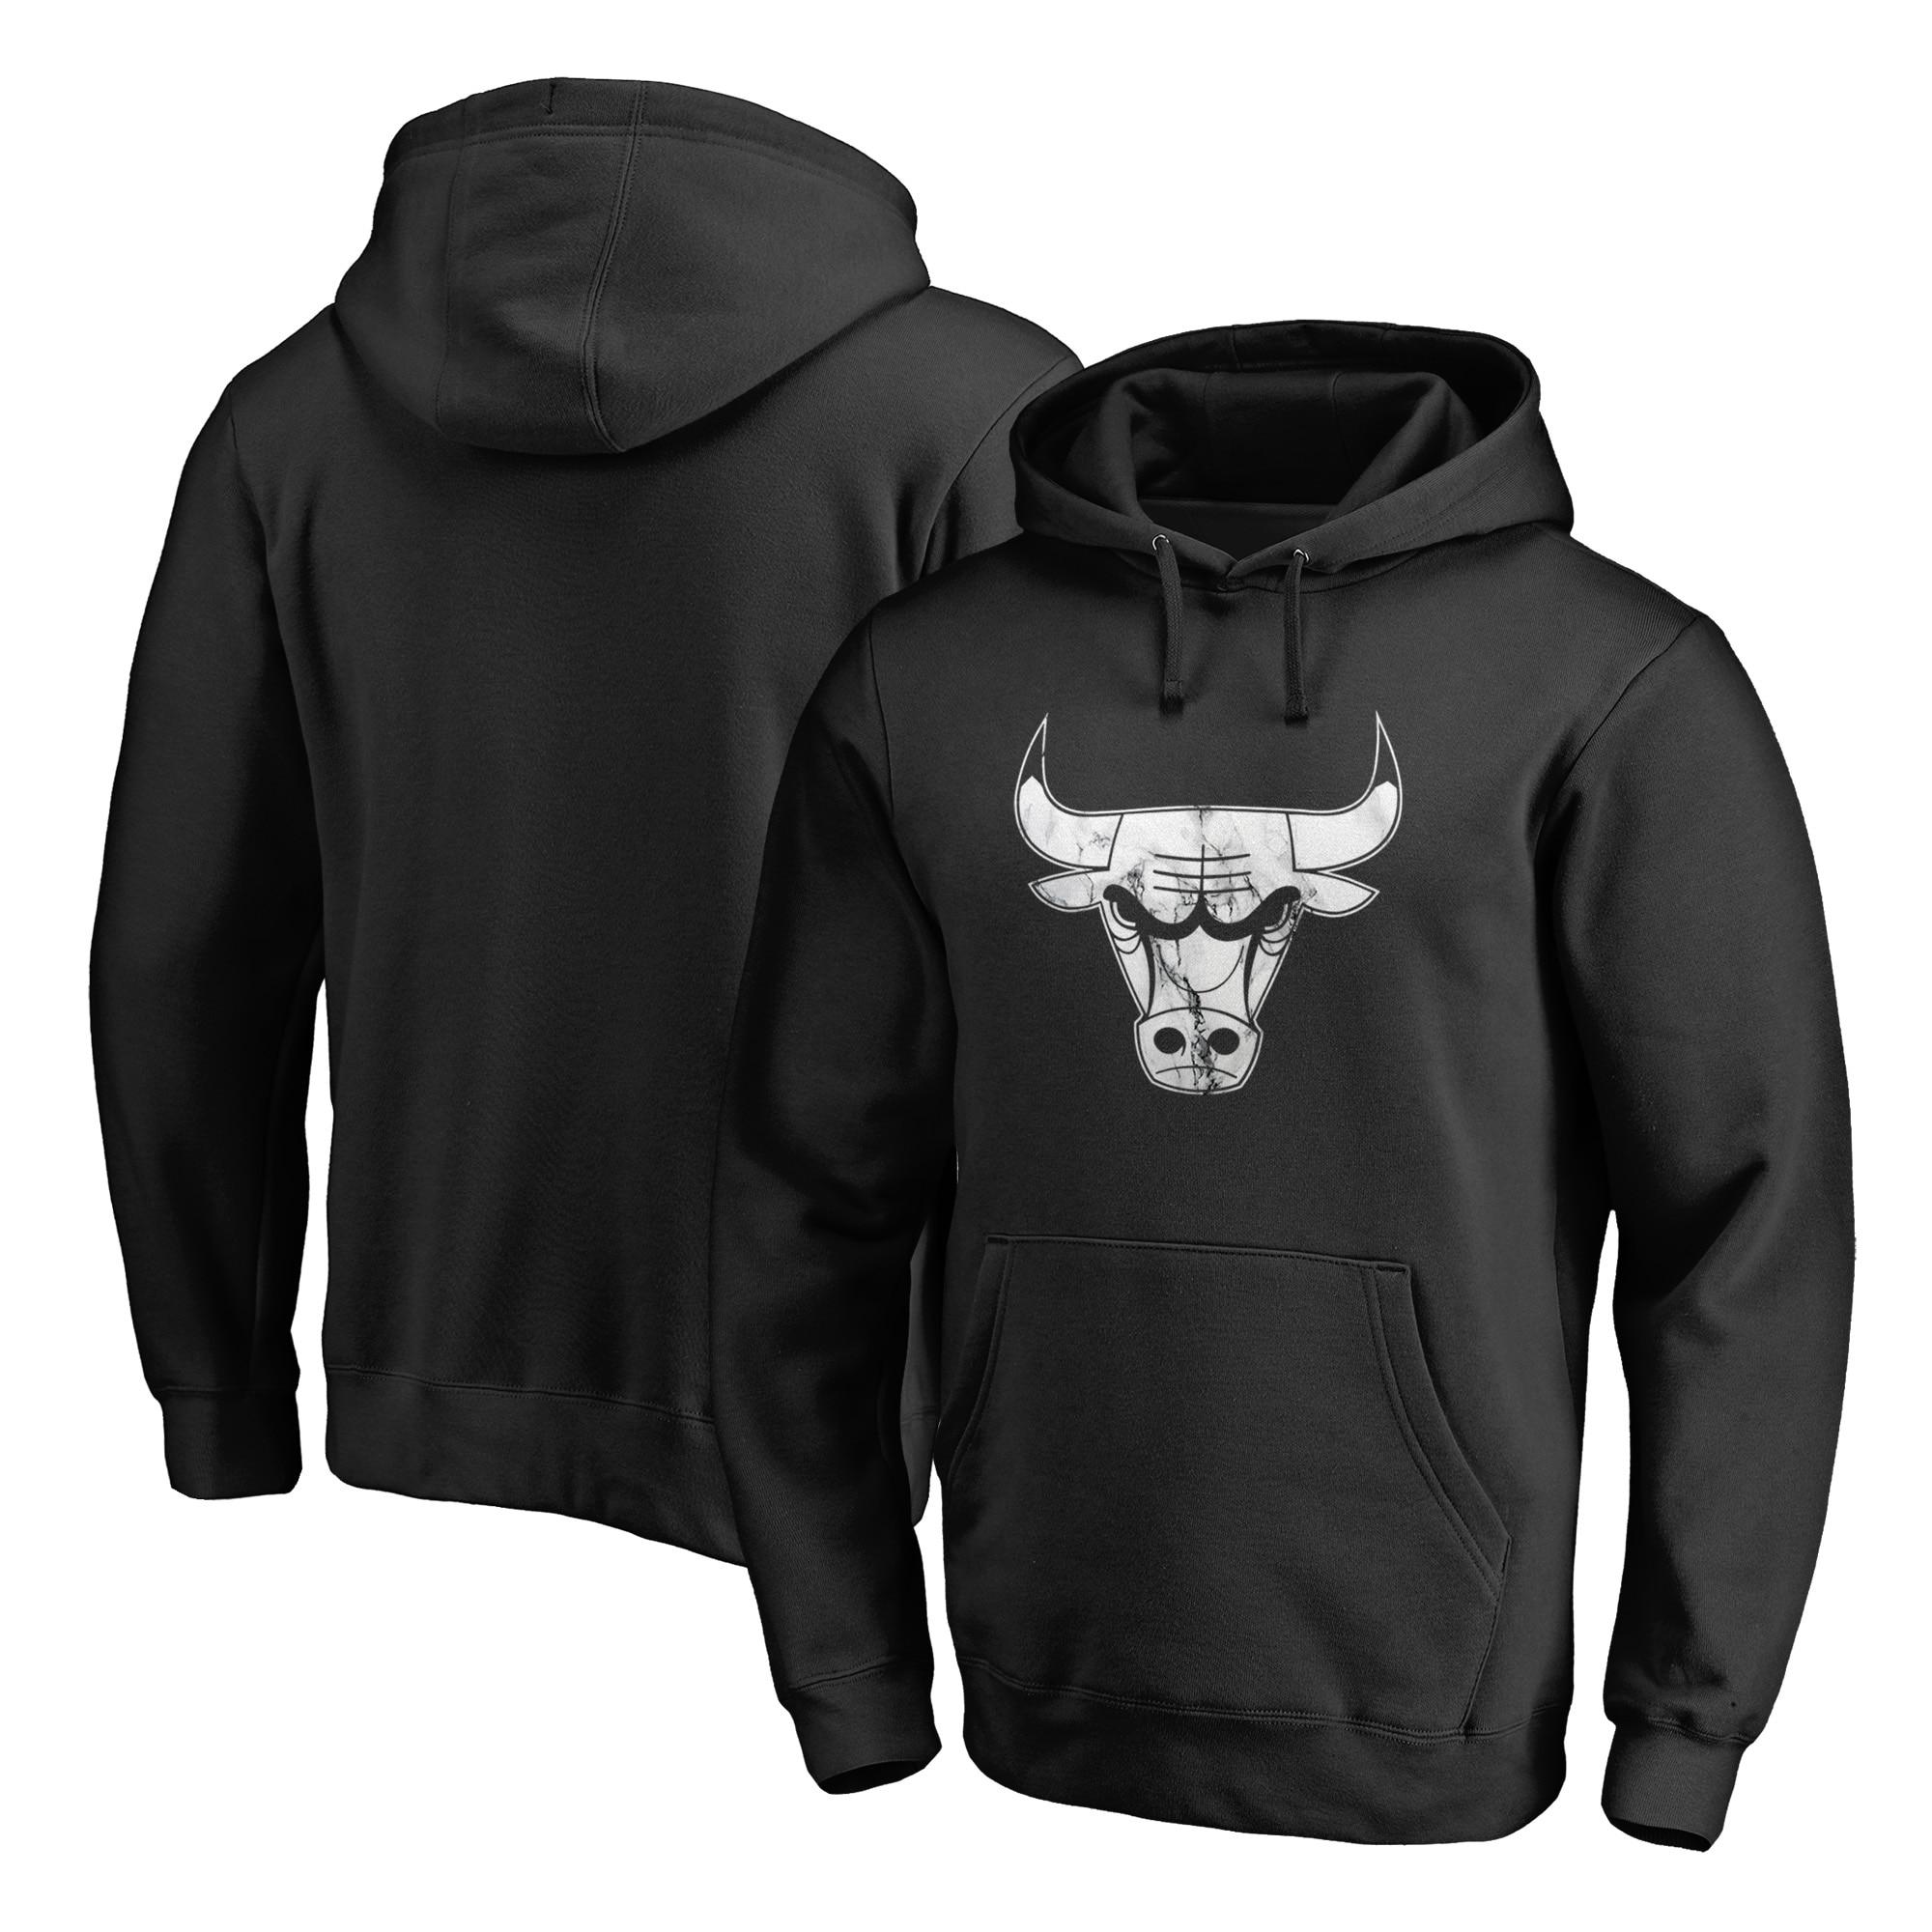 Chicago Bulls Fanatics Branded Marble Logo Pullover Hoodie - Black